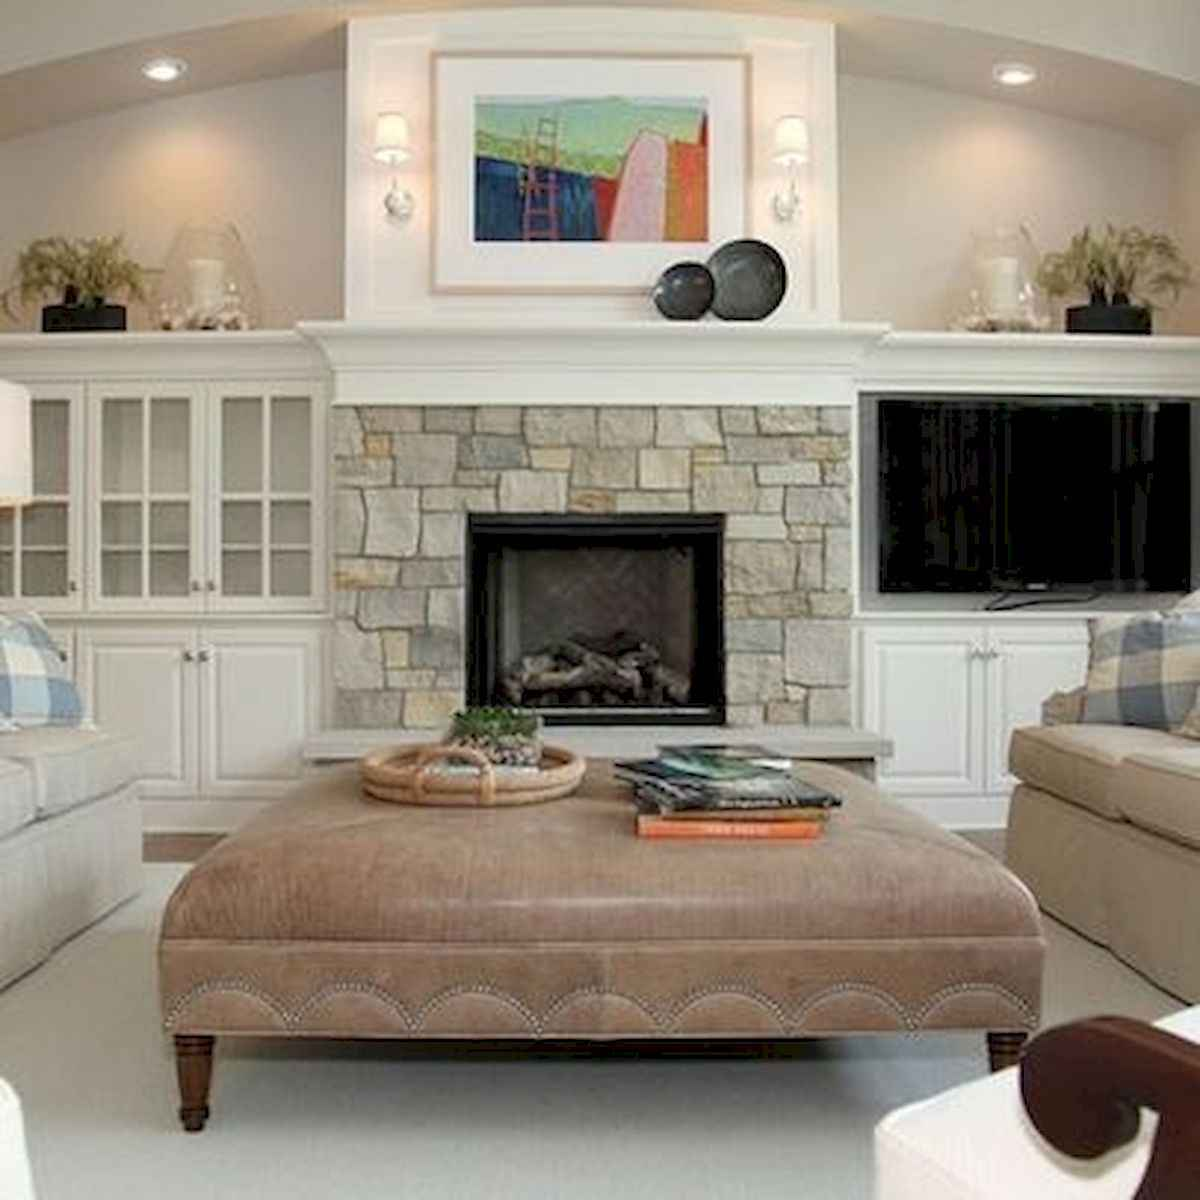 40 Awesome Fireplace Makeover For Farmhouse Home Decor (17)